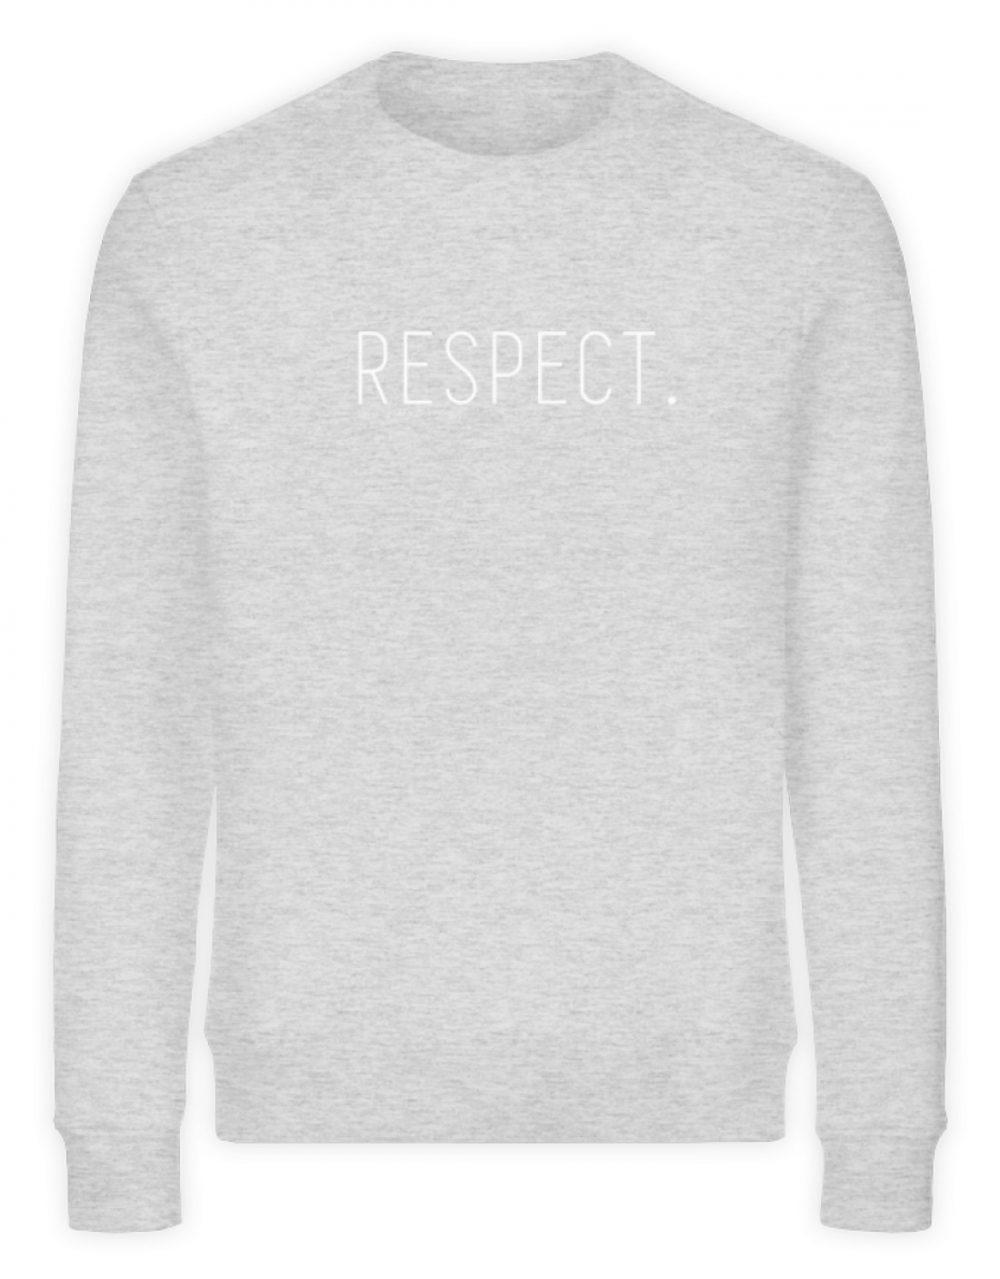 RESPECT. - Unisex Organic Sweatshirt-6892